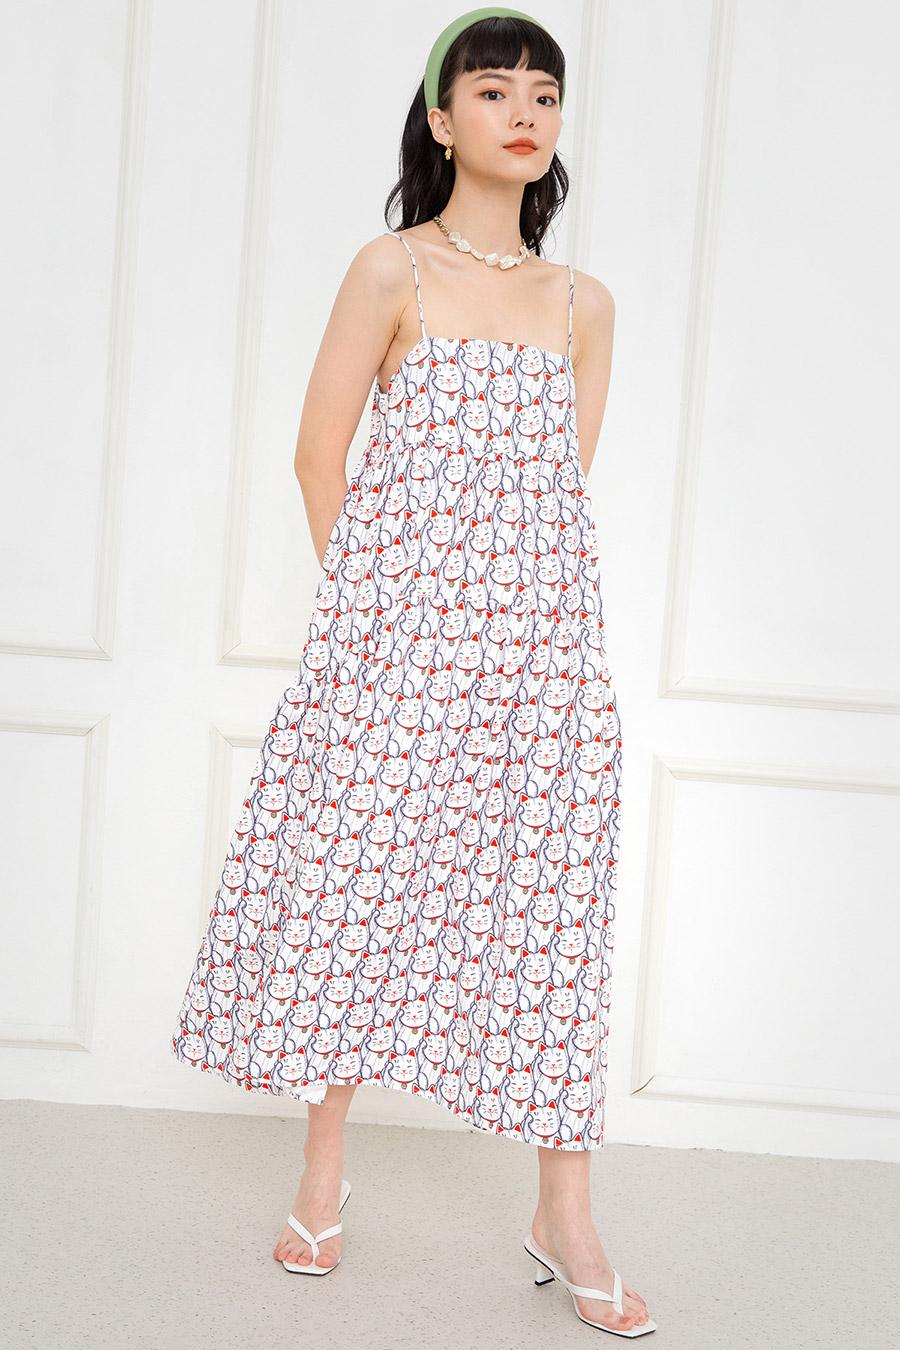 *BO 2* OLIVIA DRESS - MANEKI NEKO [BY MODPARADE]